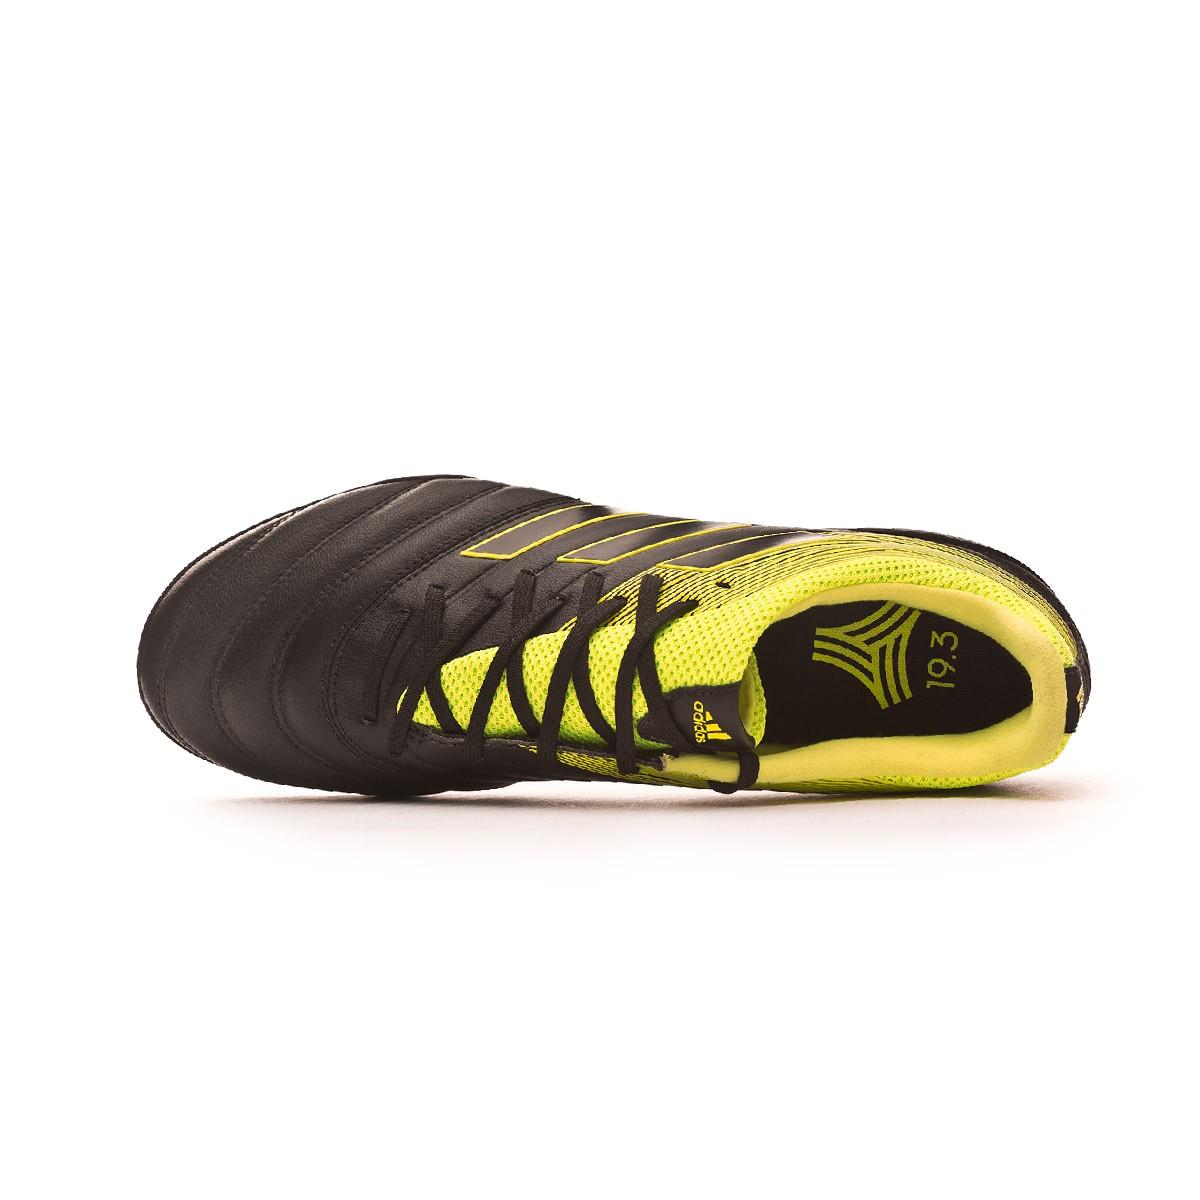 46f9a1b72b573 Tenis adidas Copa Tango 19.3 Turf Core black-Solar yellow-Core black -  Tienda de fútbol Fútbol Emotion